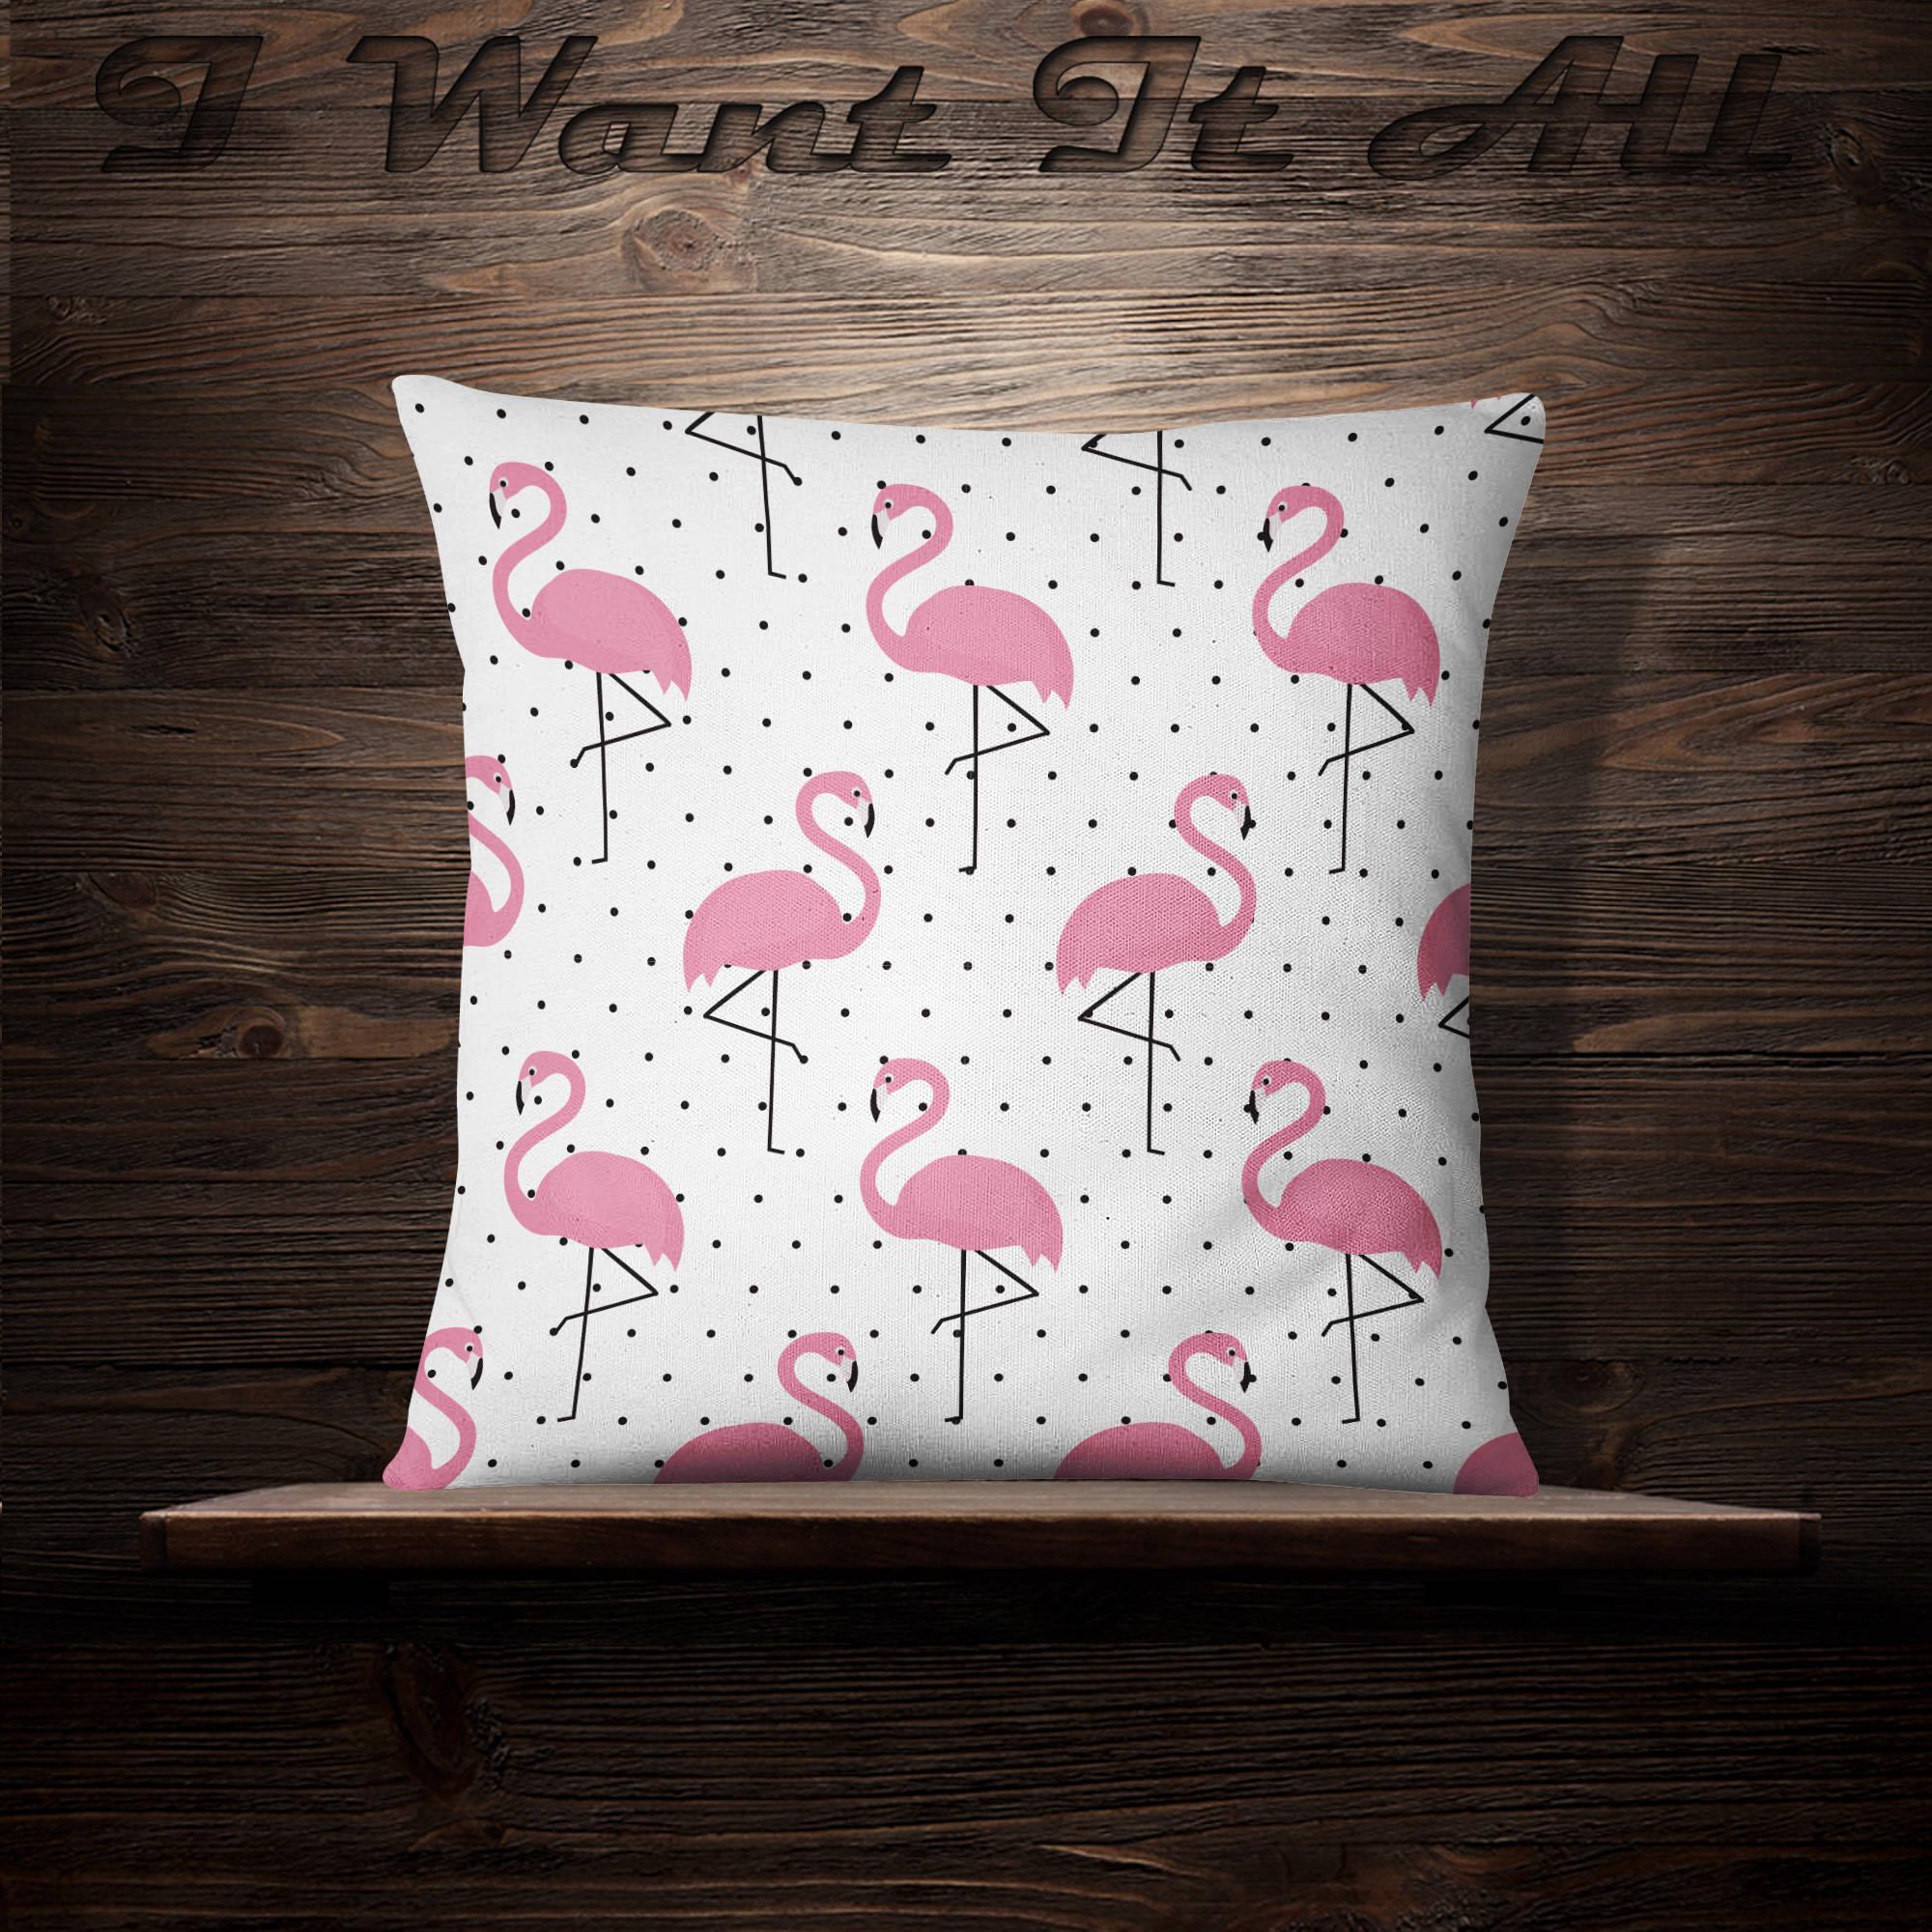 flamingo pillow flamingo pillow case flamingo throw pillow flamingo pillow cover flamingo cushion flamingo dcor flamingo pillow